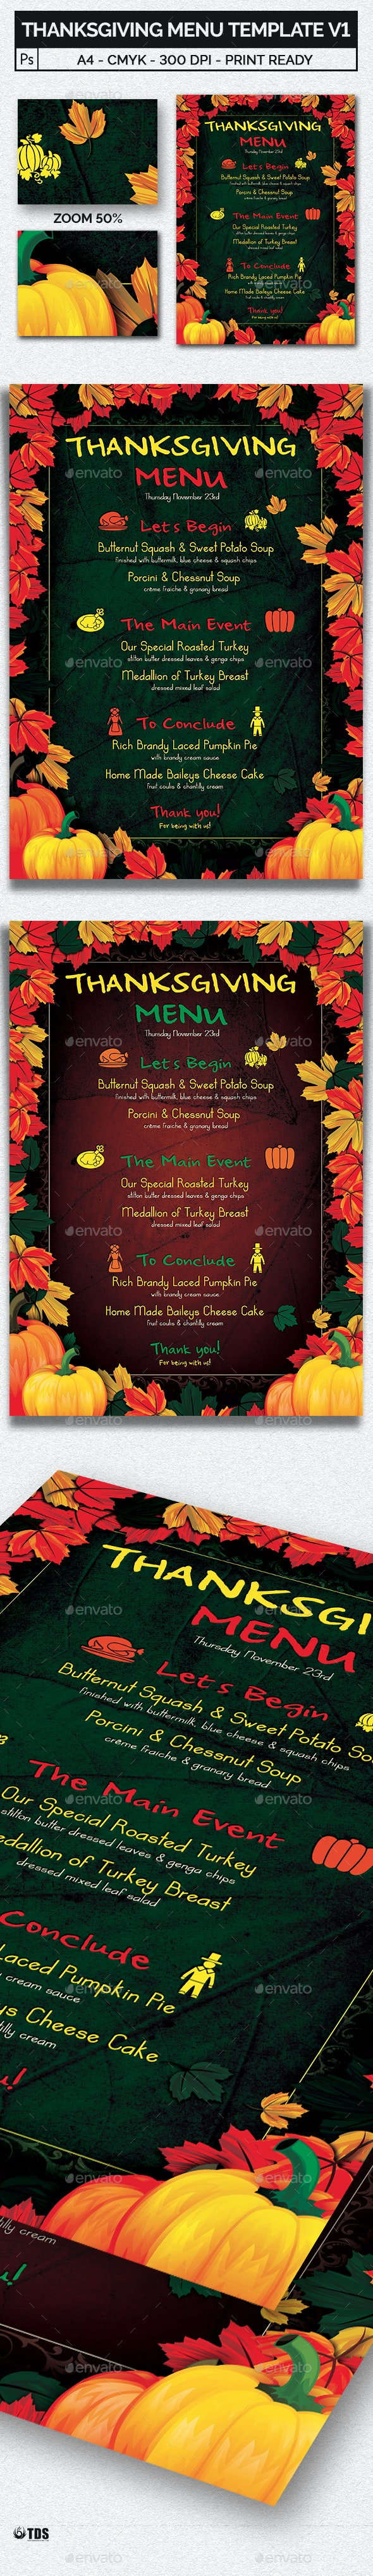 Thanksgiving Menu Template V1 - Restaurant Flyers